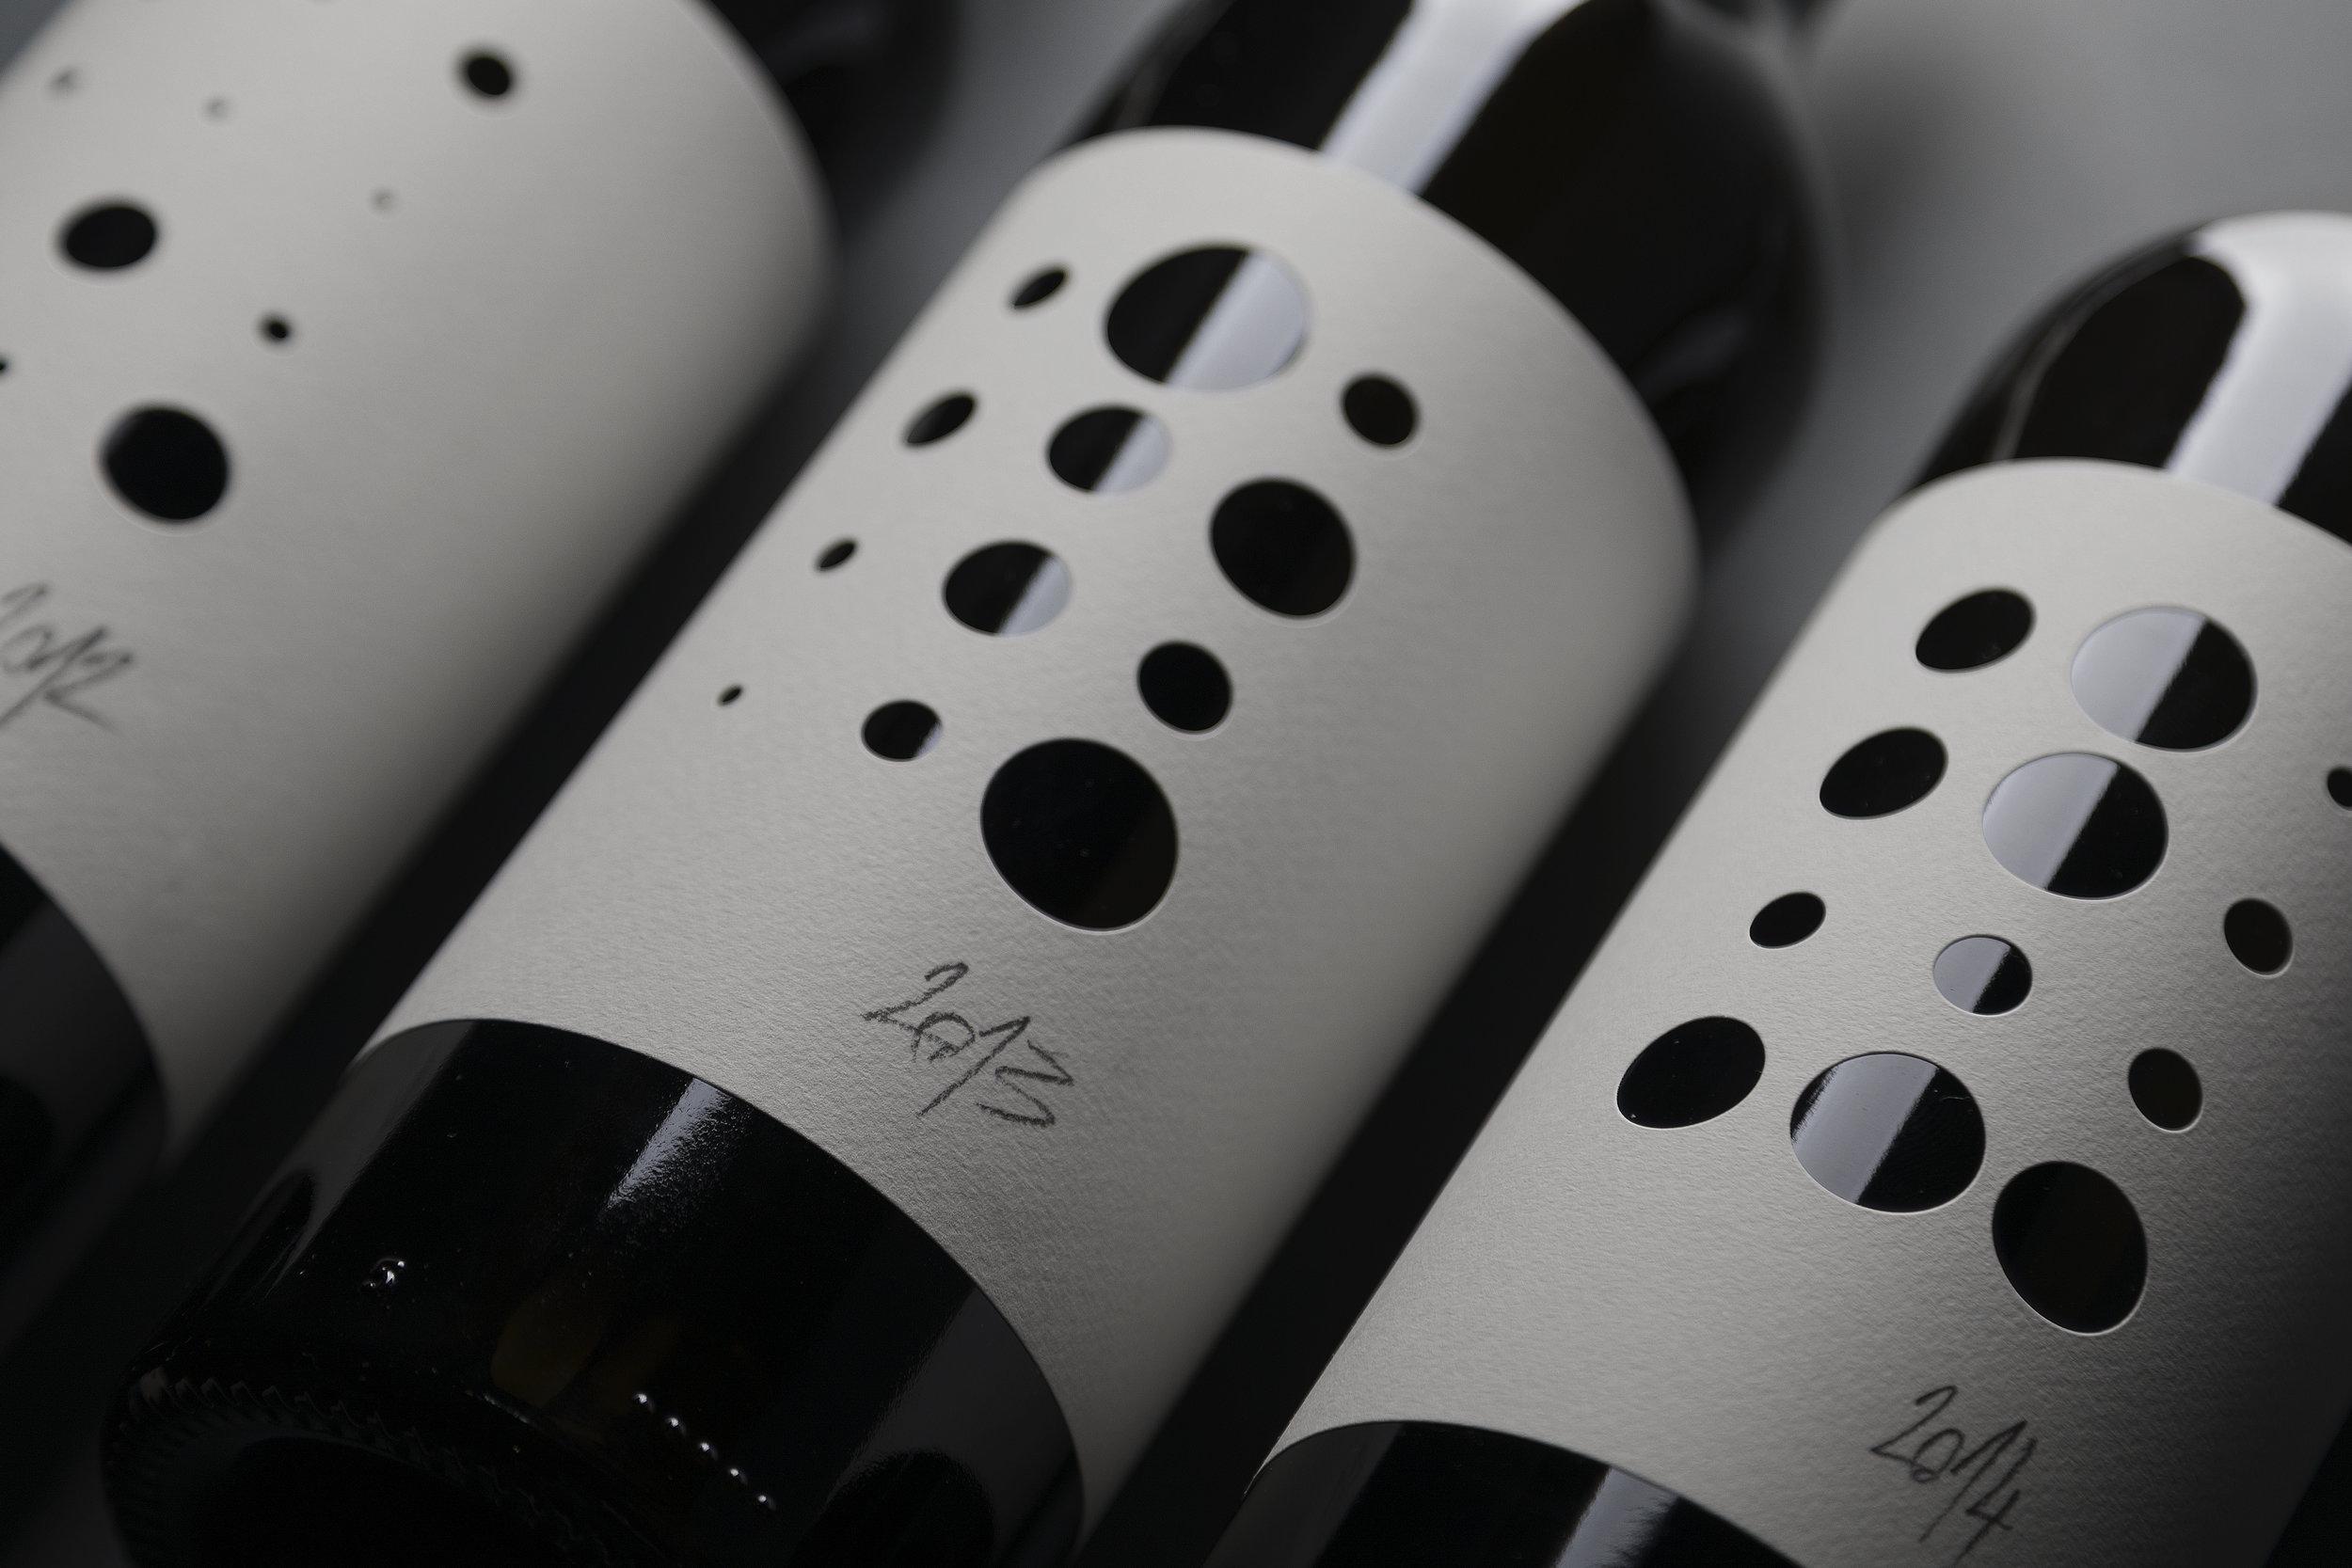 STUDIO SONDA - Piquentum St. Vital 121314 Collection Wine  (2)